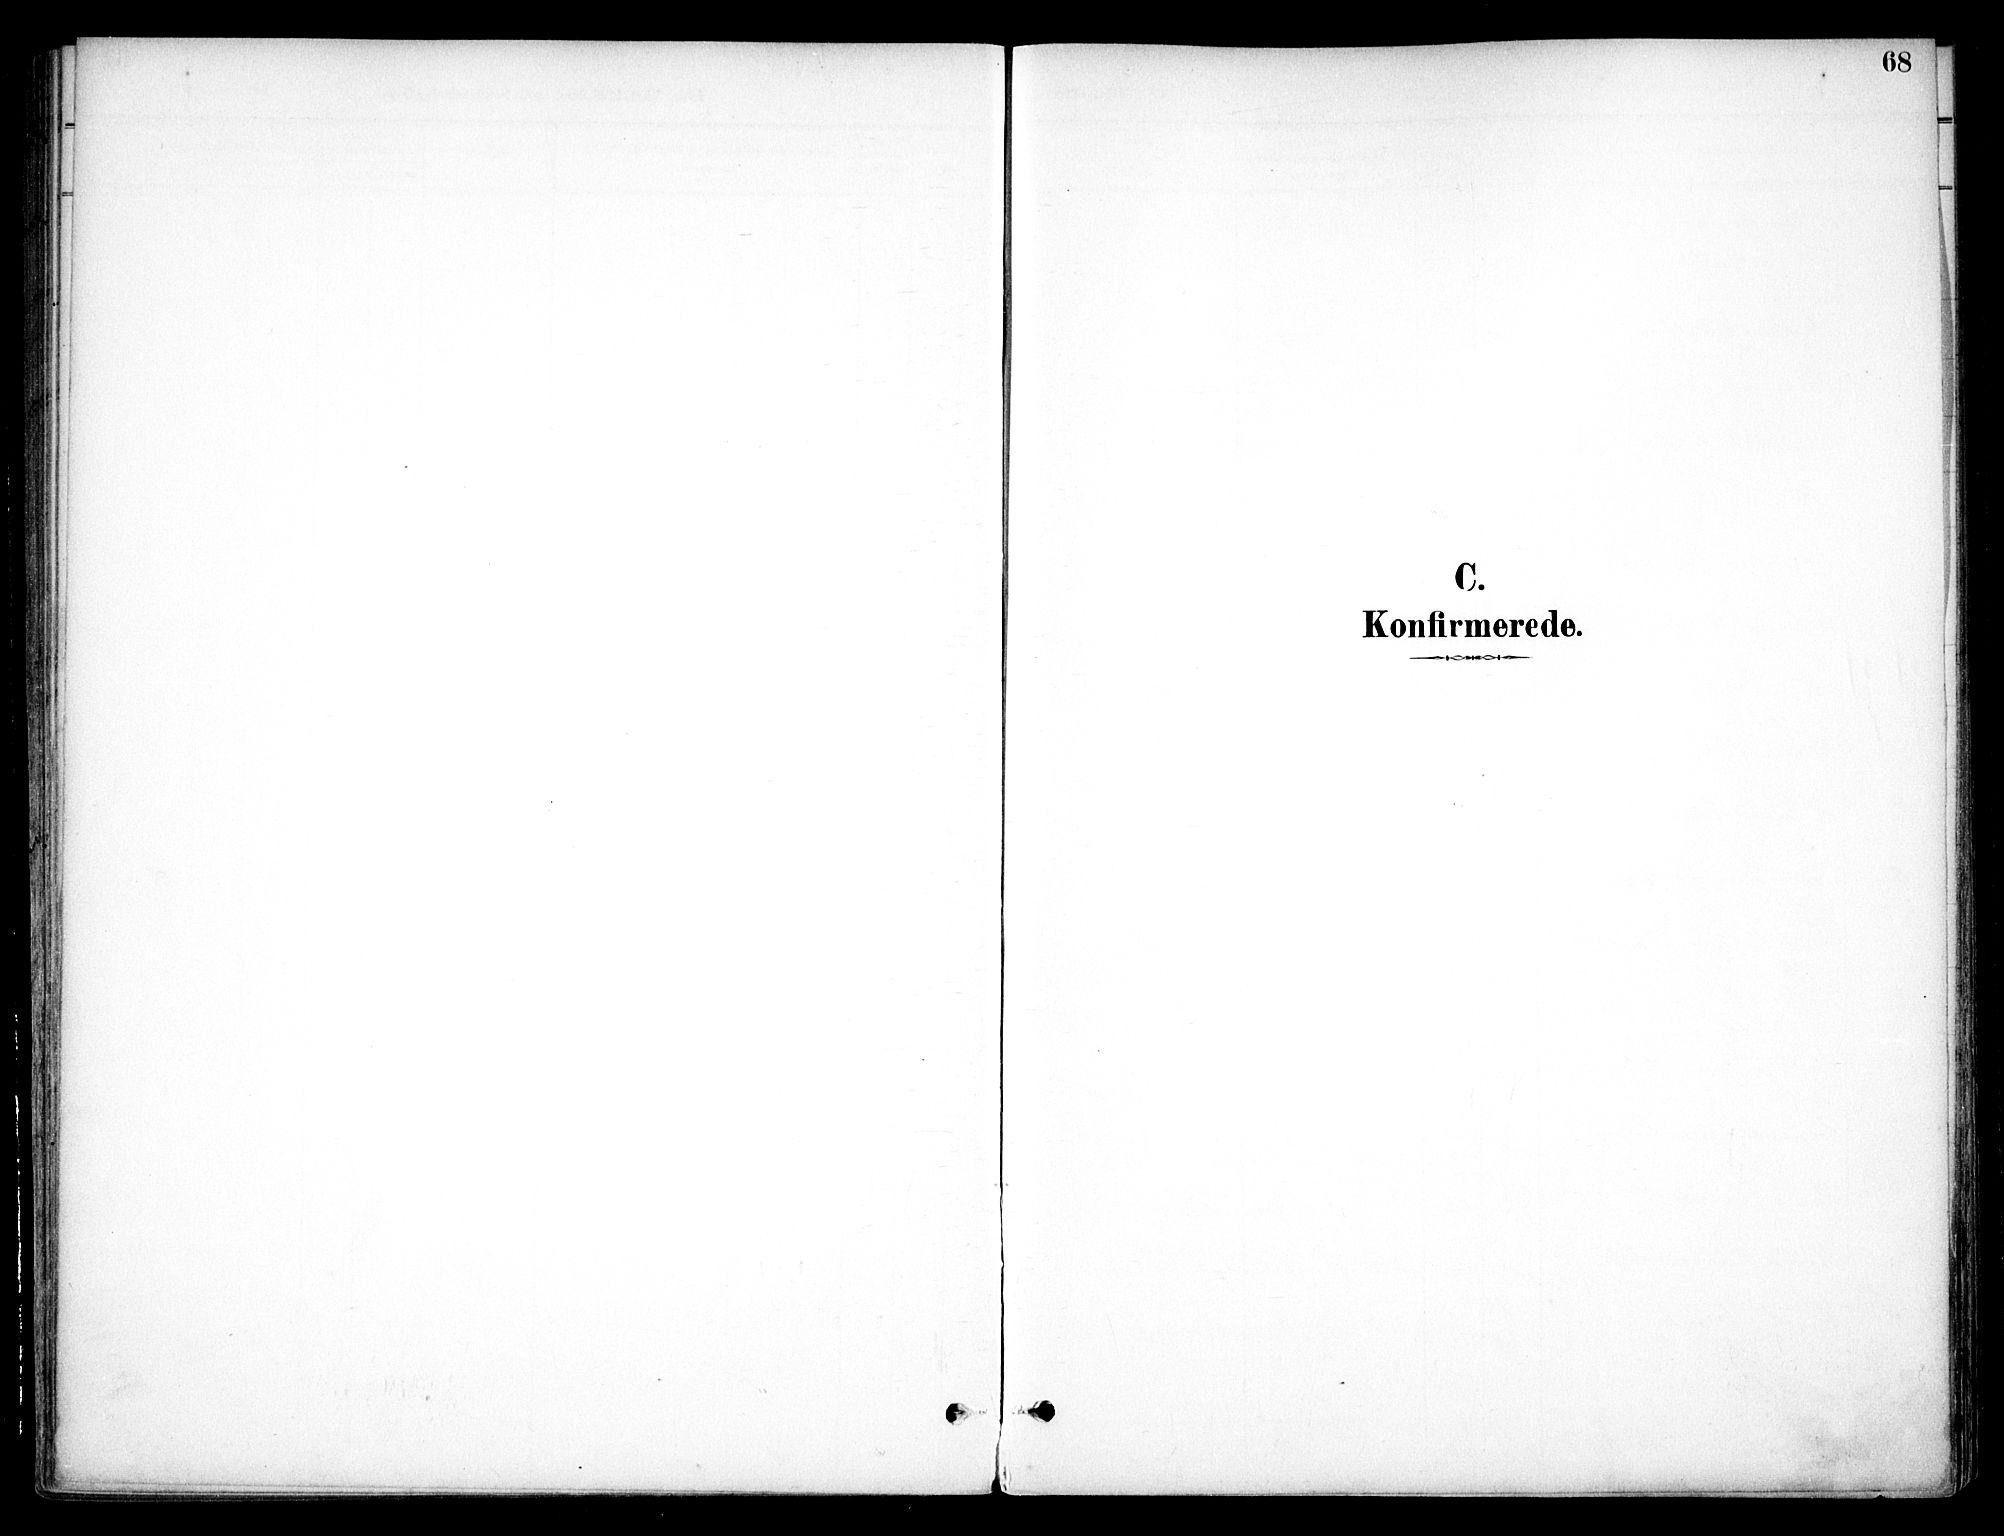 SAO, Nannestad prestekontor Kirkebøker, F/Fc/L0002: Ministerialbok nr. III 2, 1893-1907, s. 68